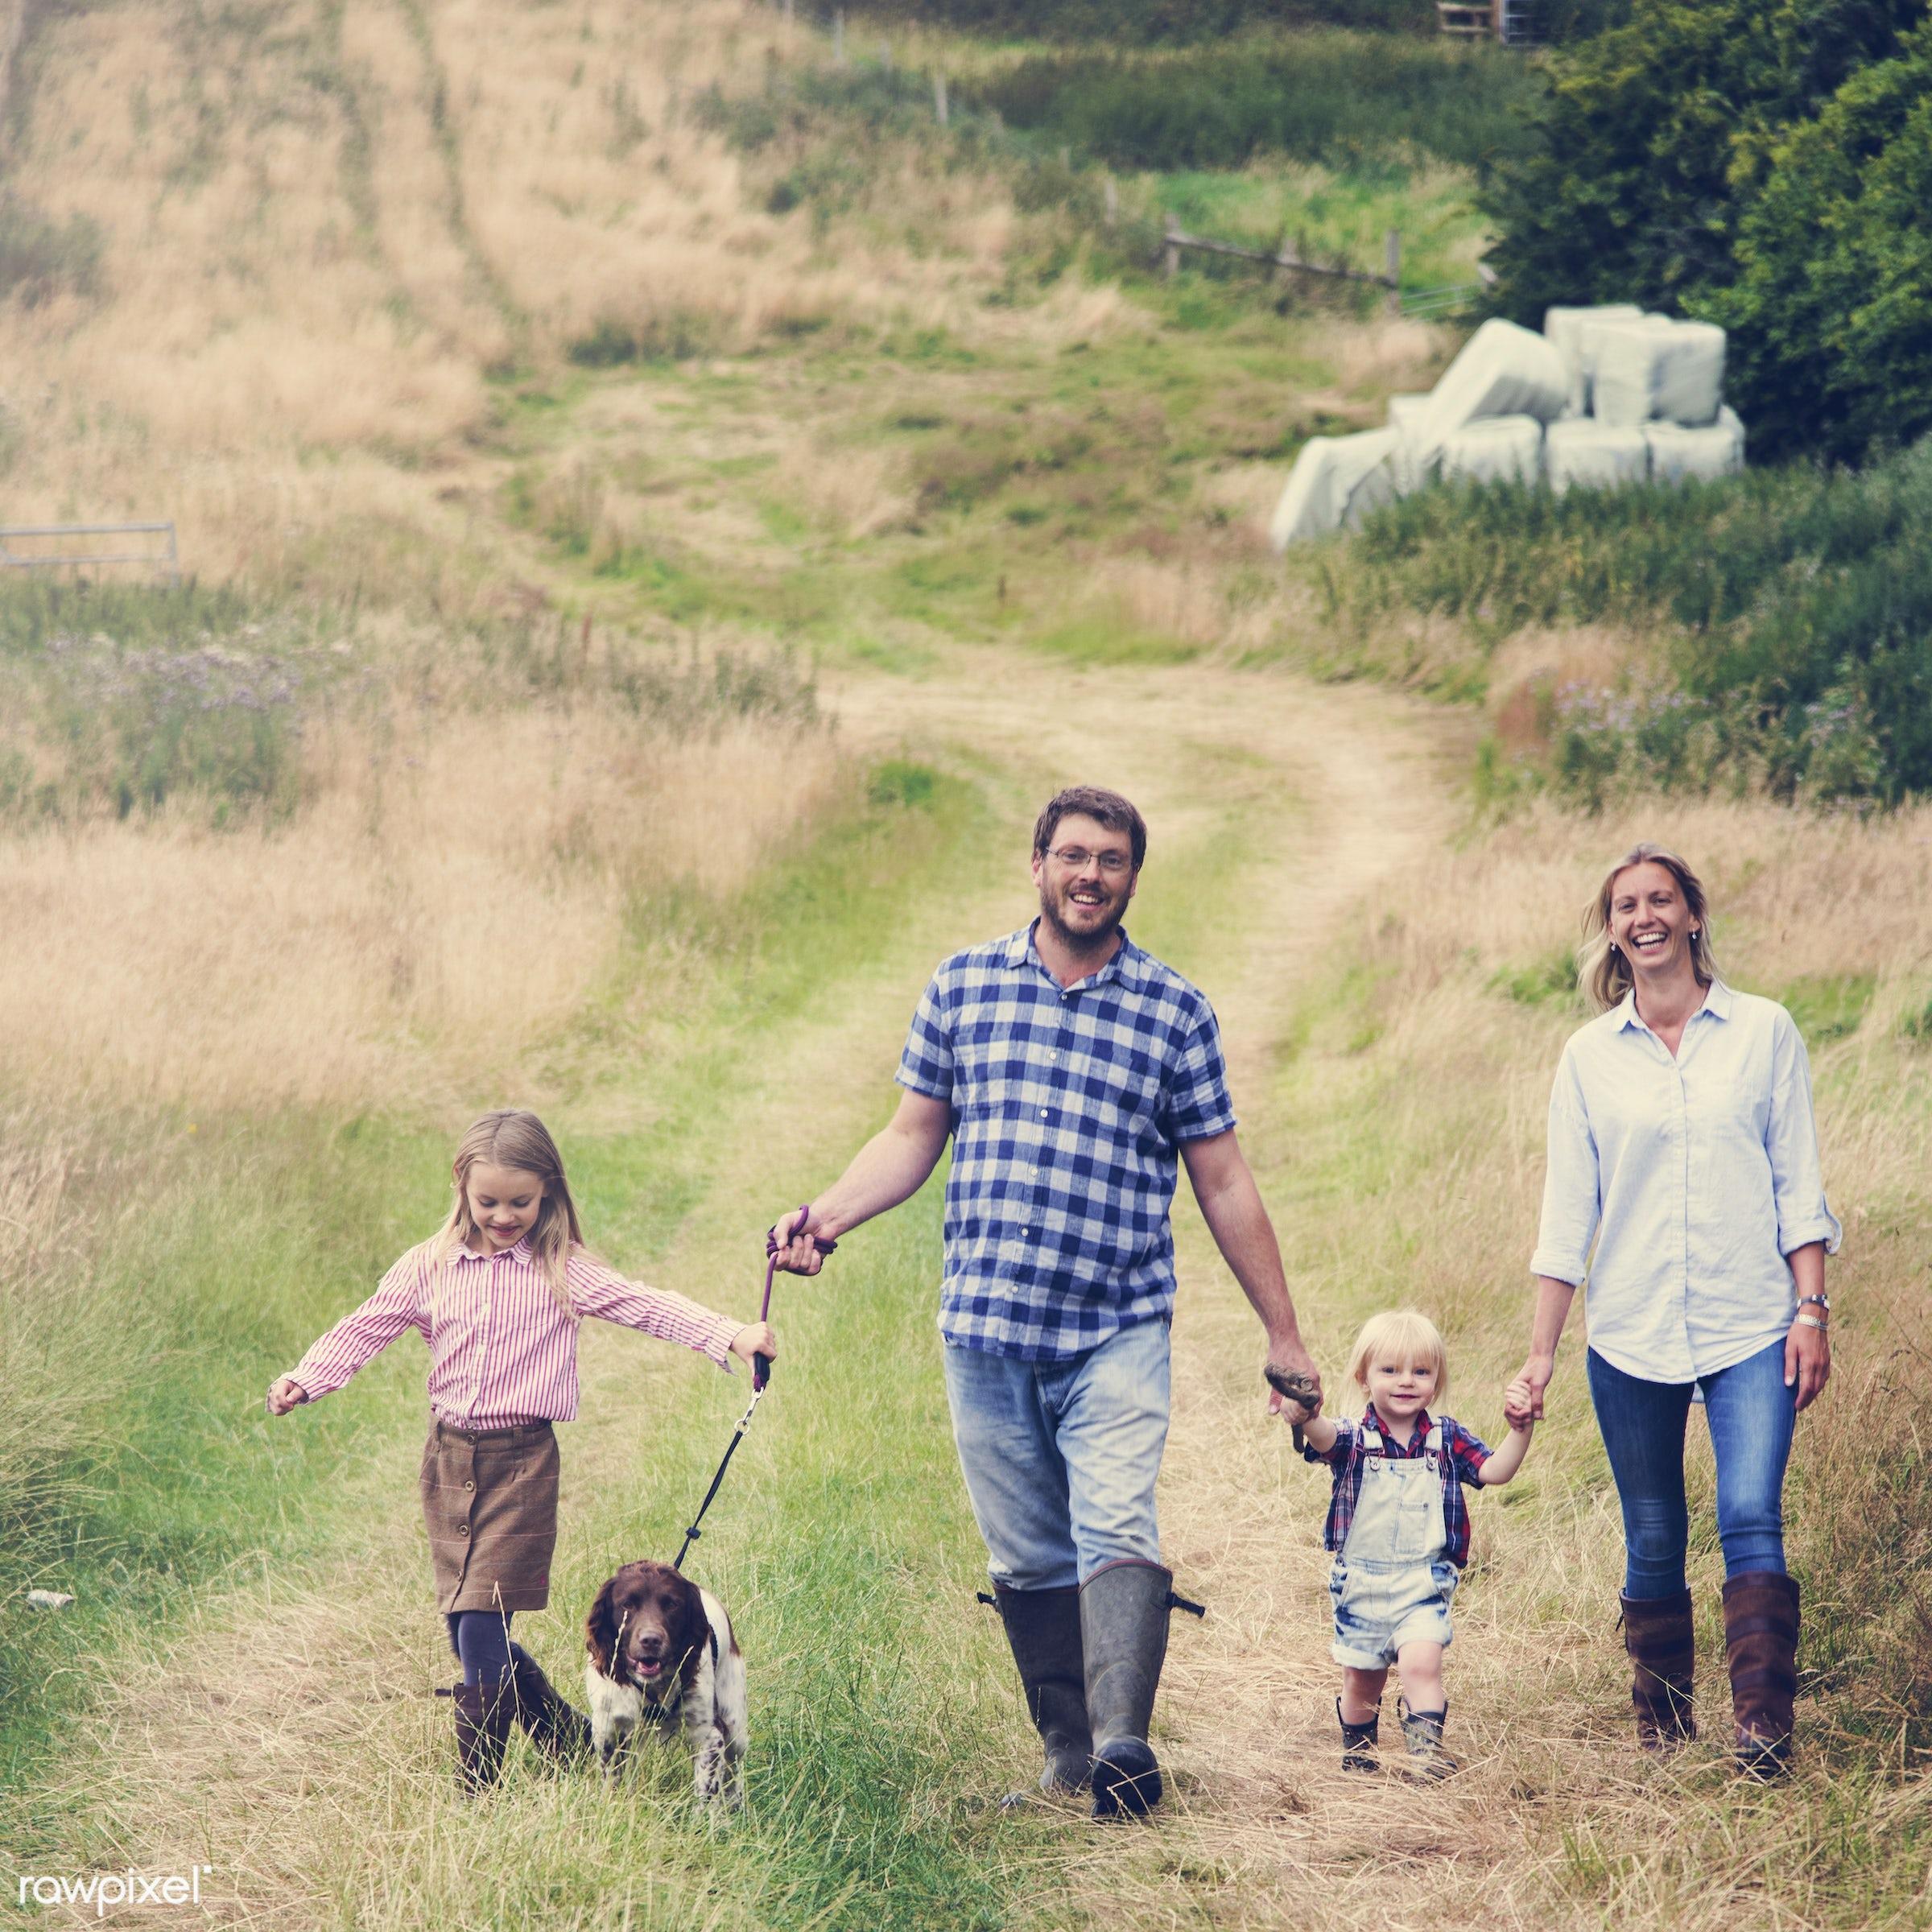 bonding, boy, care, casual, cheerful, childhood, children, cocker spaniel, daughter, dog, enjoyment, environmental, family,...